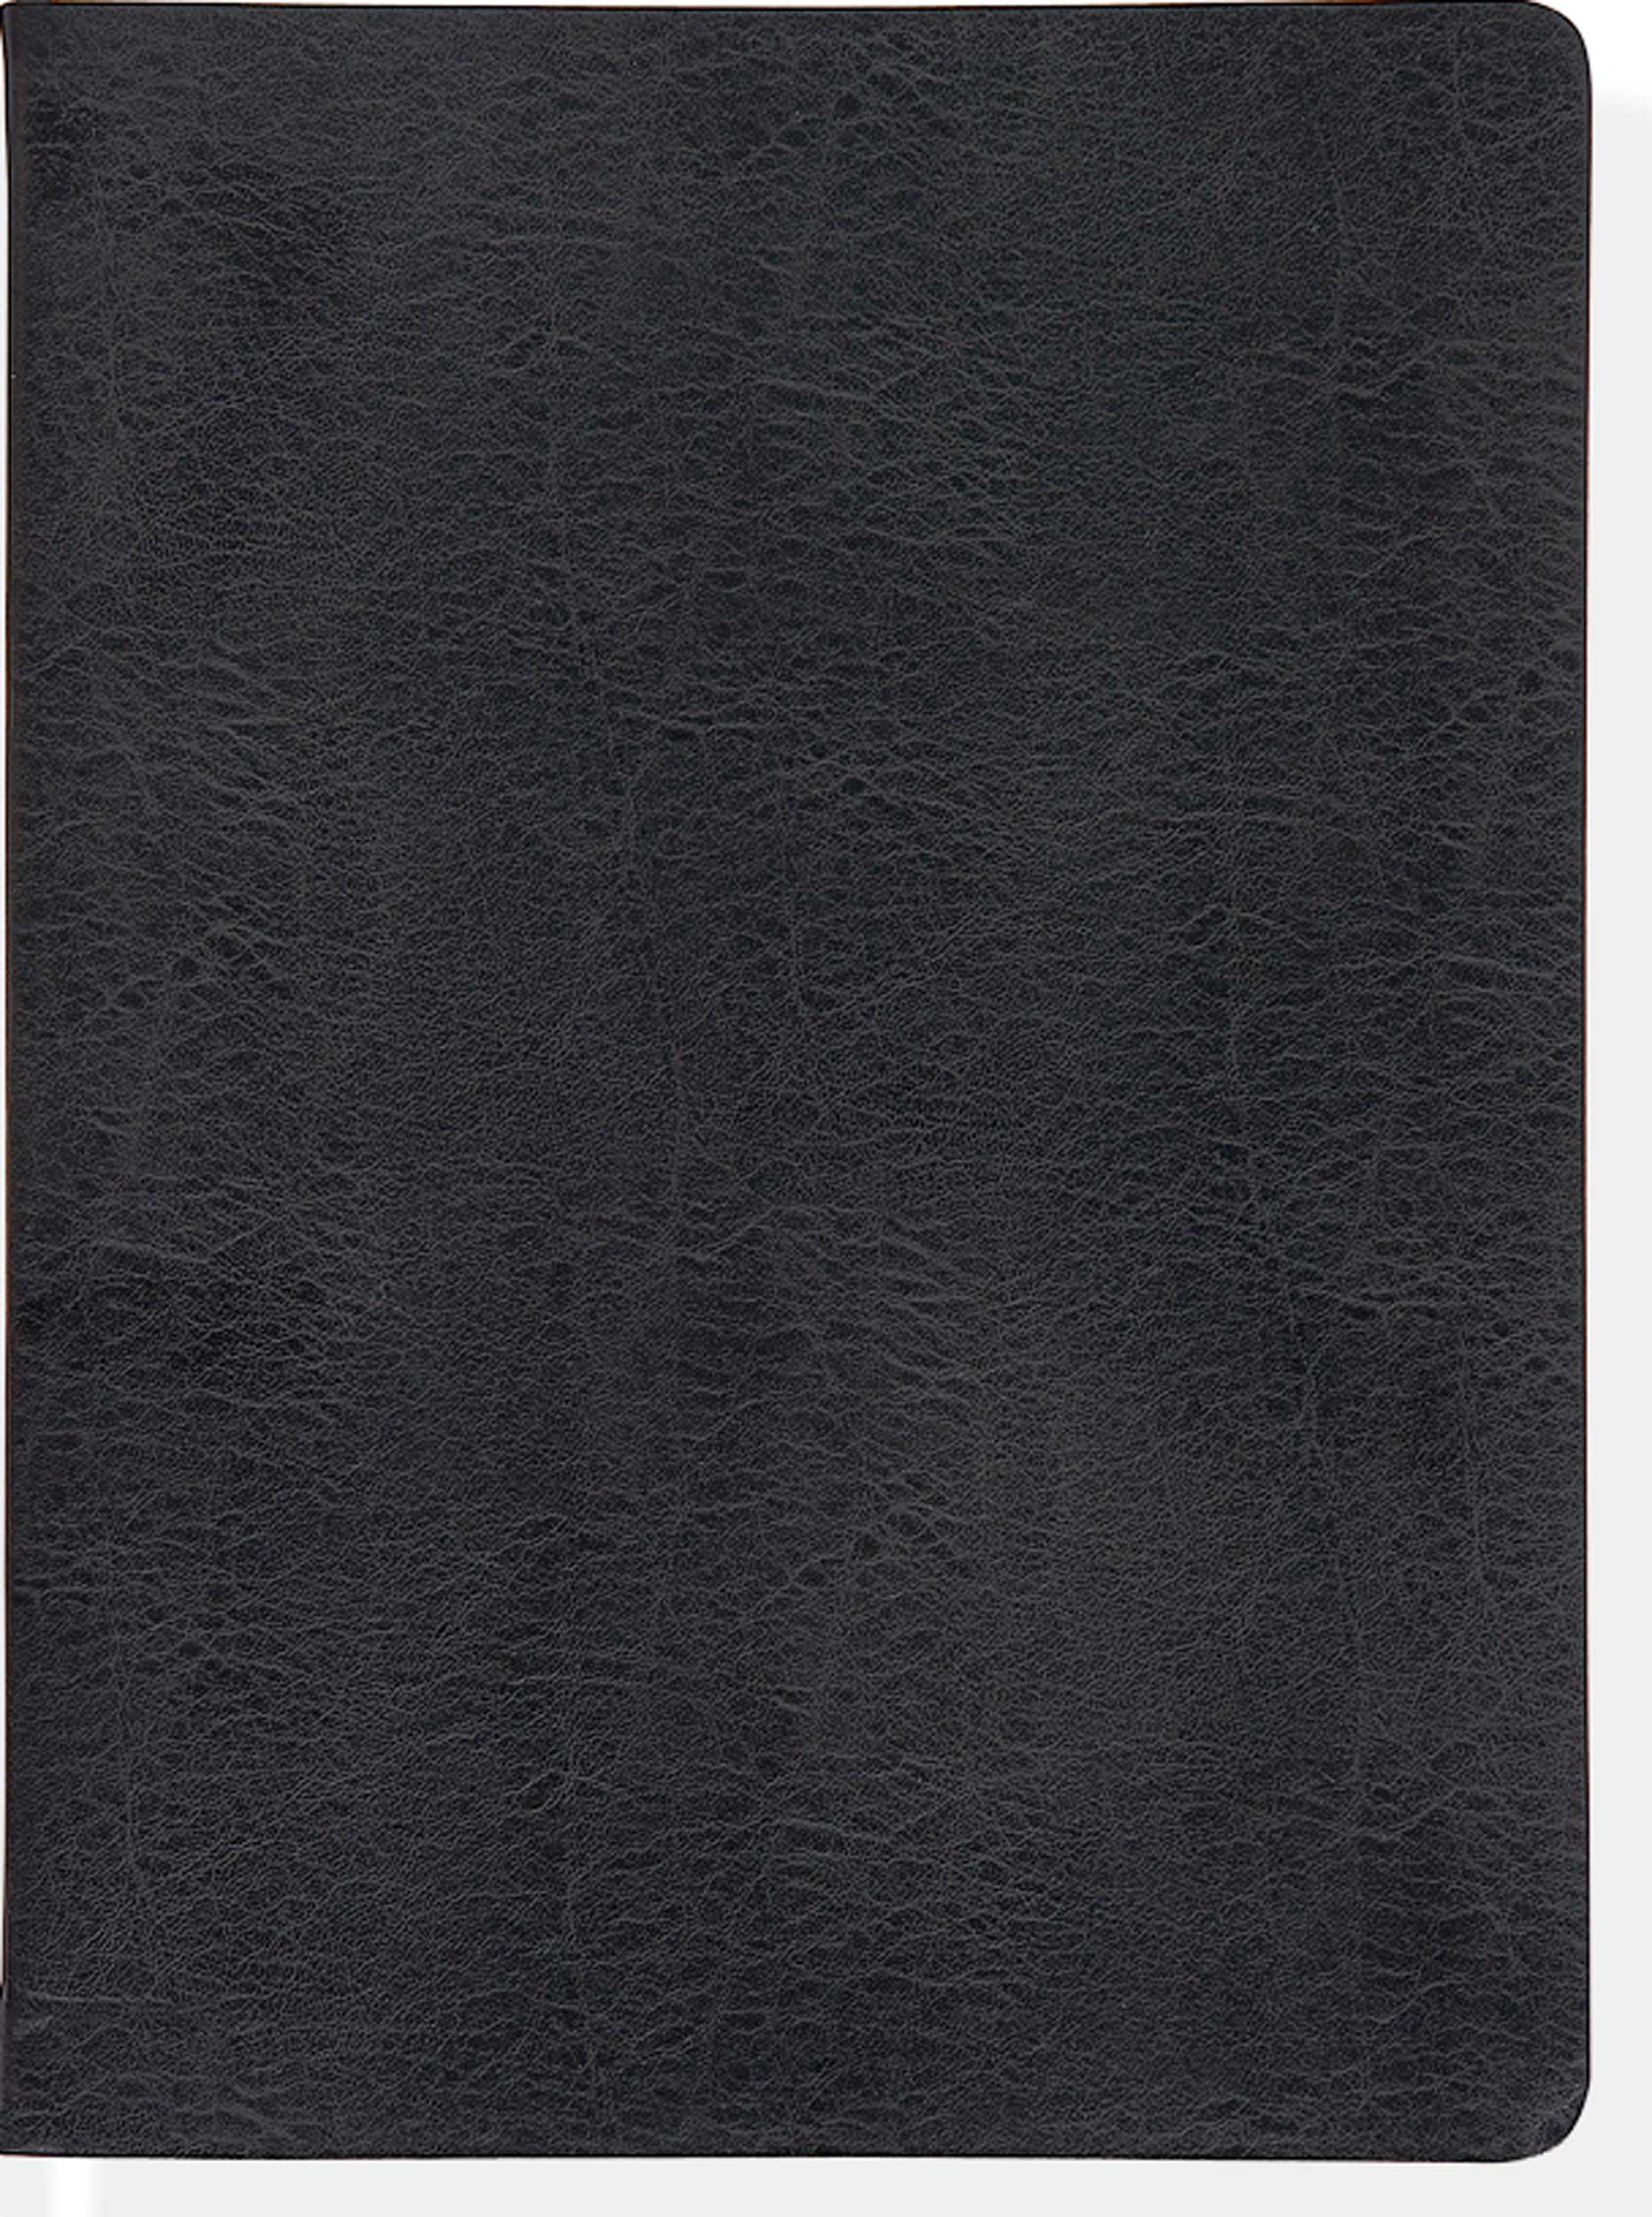 Leather Journal Flanders Black Paperme Se